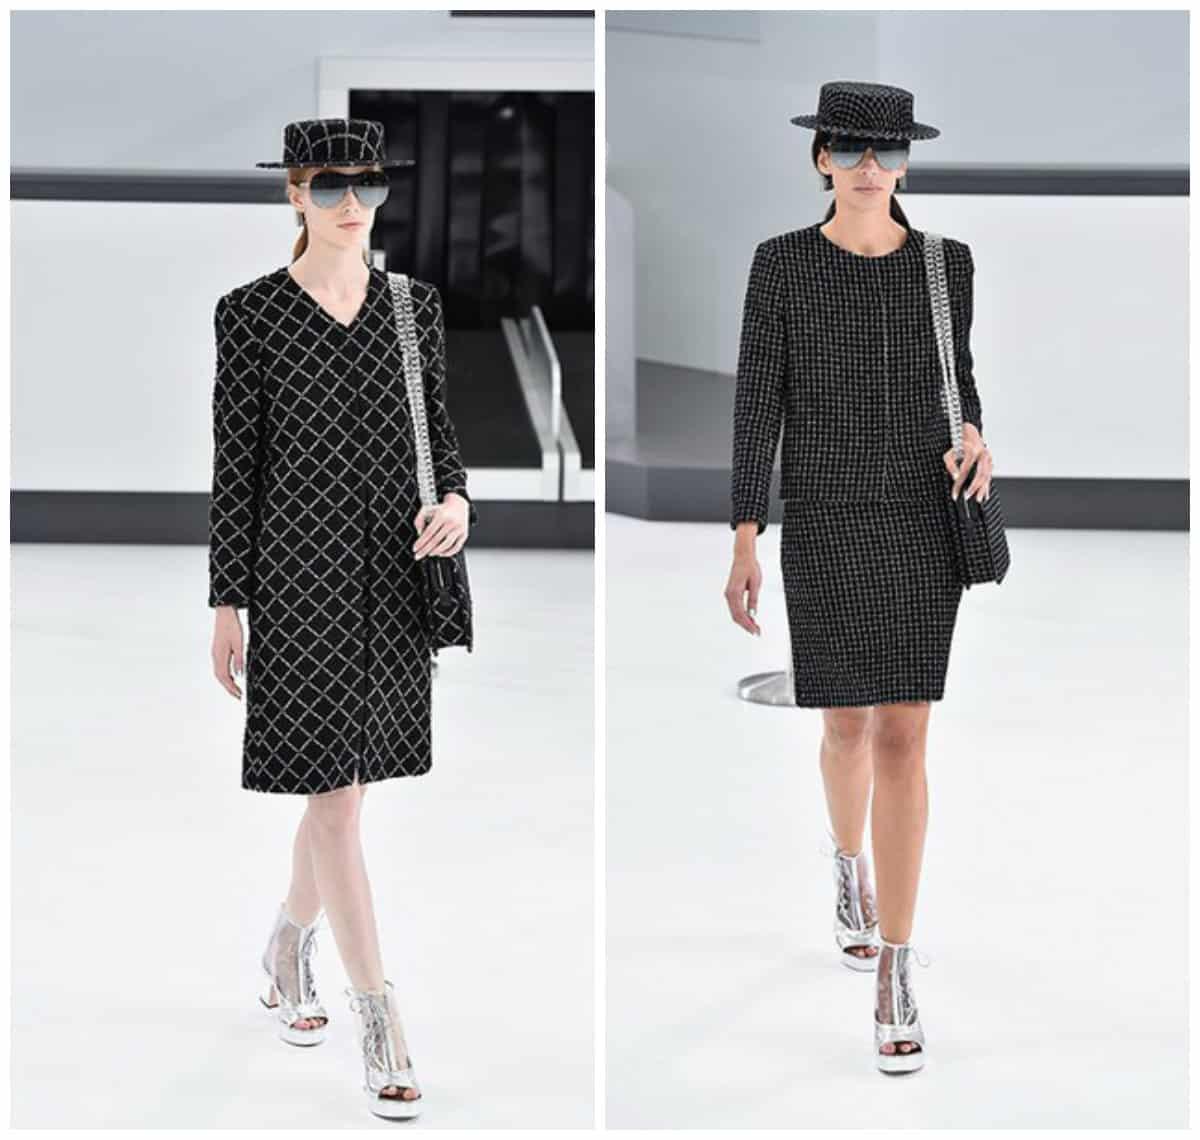 Paris-Fashion-Week-Chanel-show-Spring-Summer-2016-3